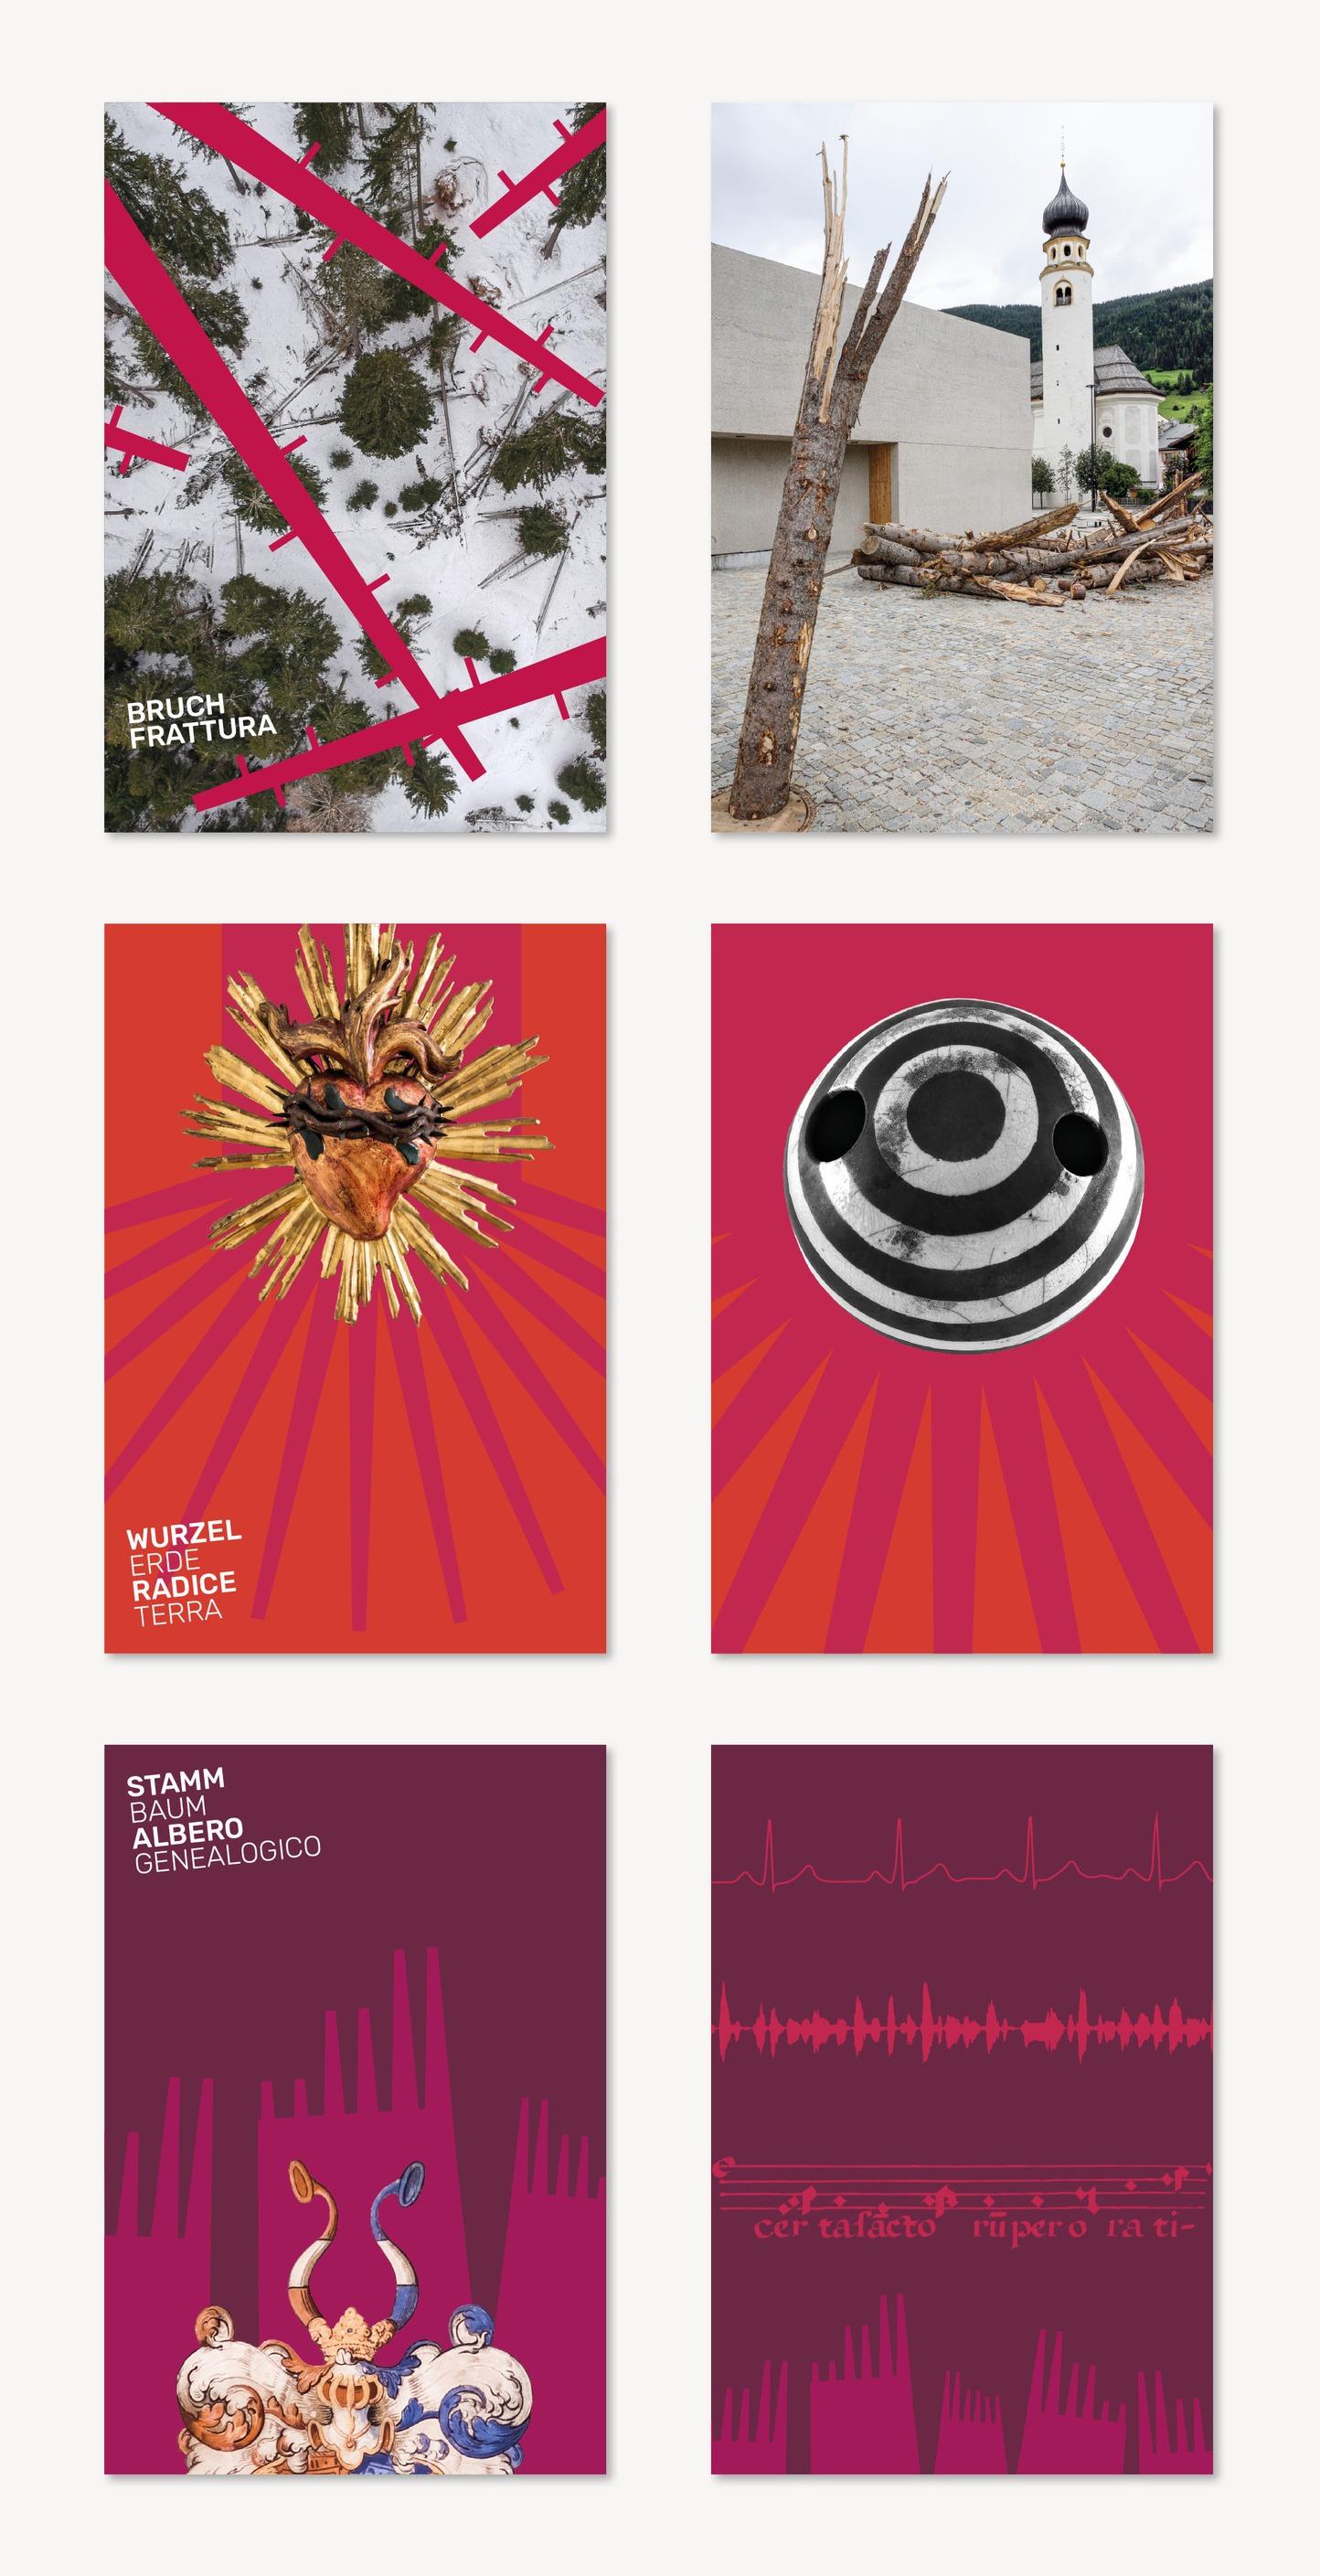 Mostra / Exhibition Noi Terra